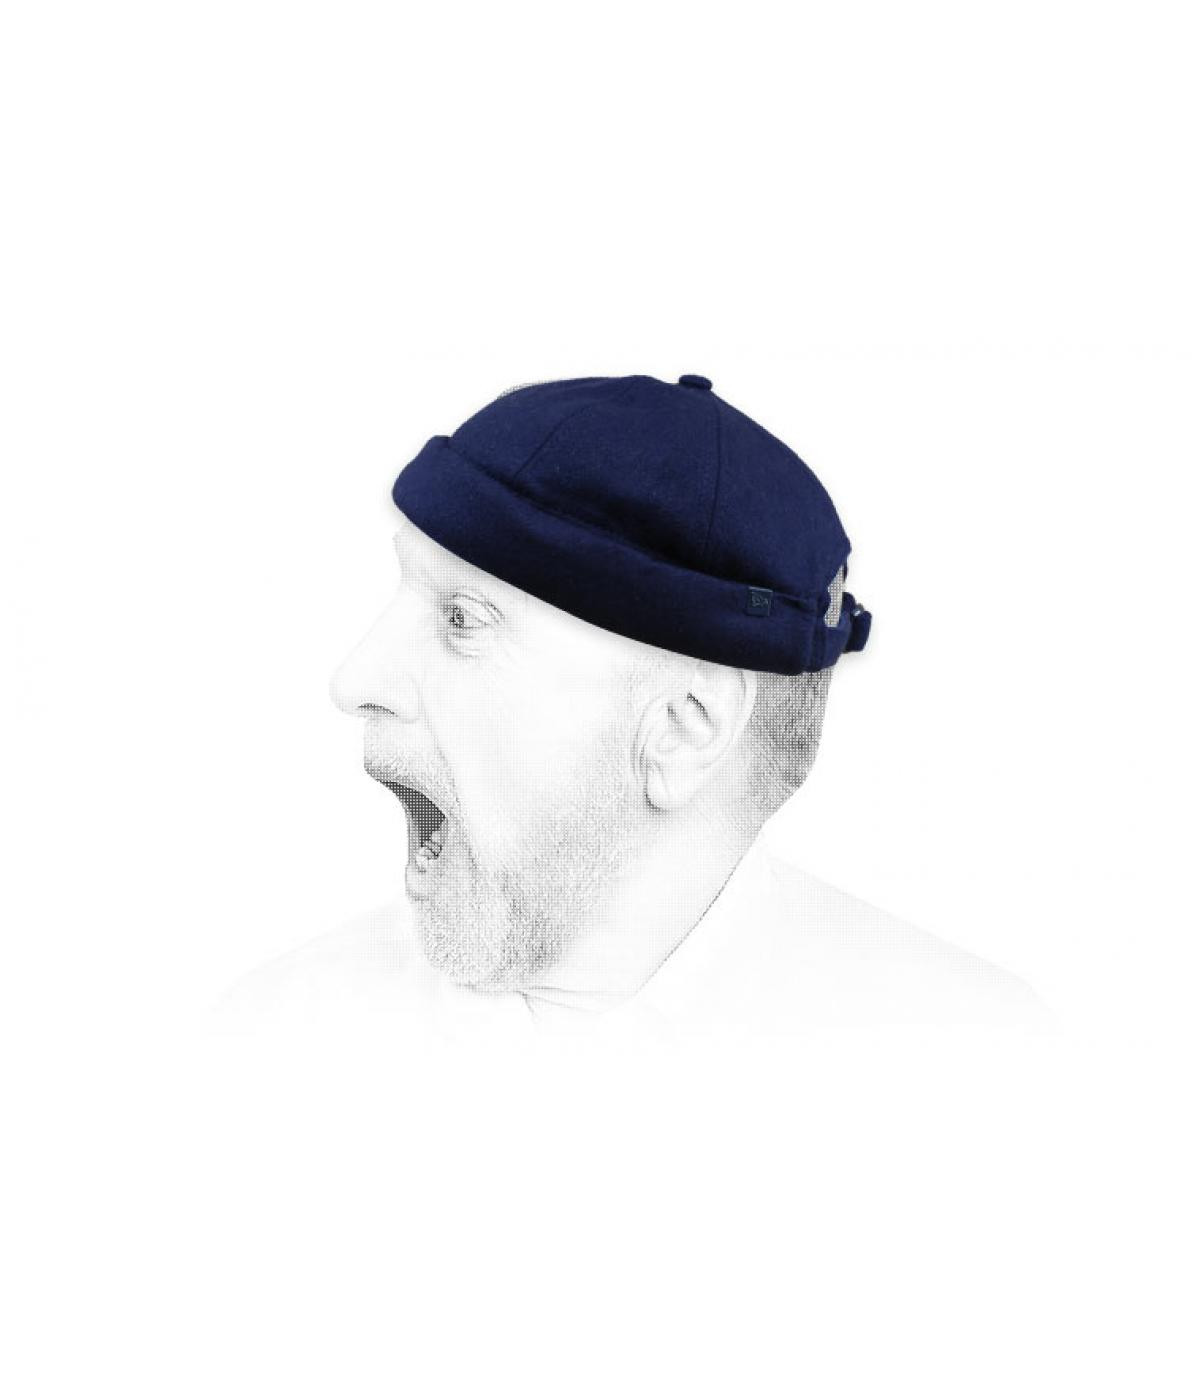 gorro docker azul lana New Era